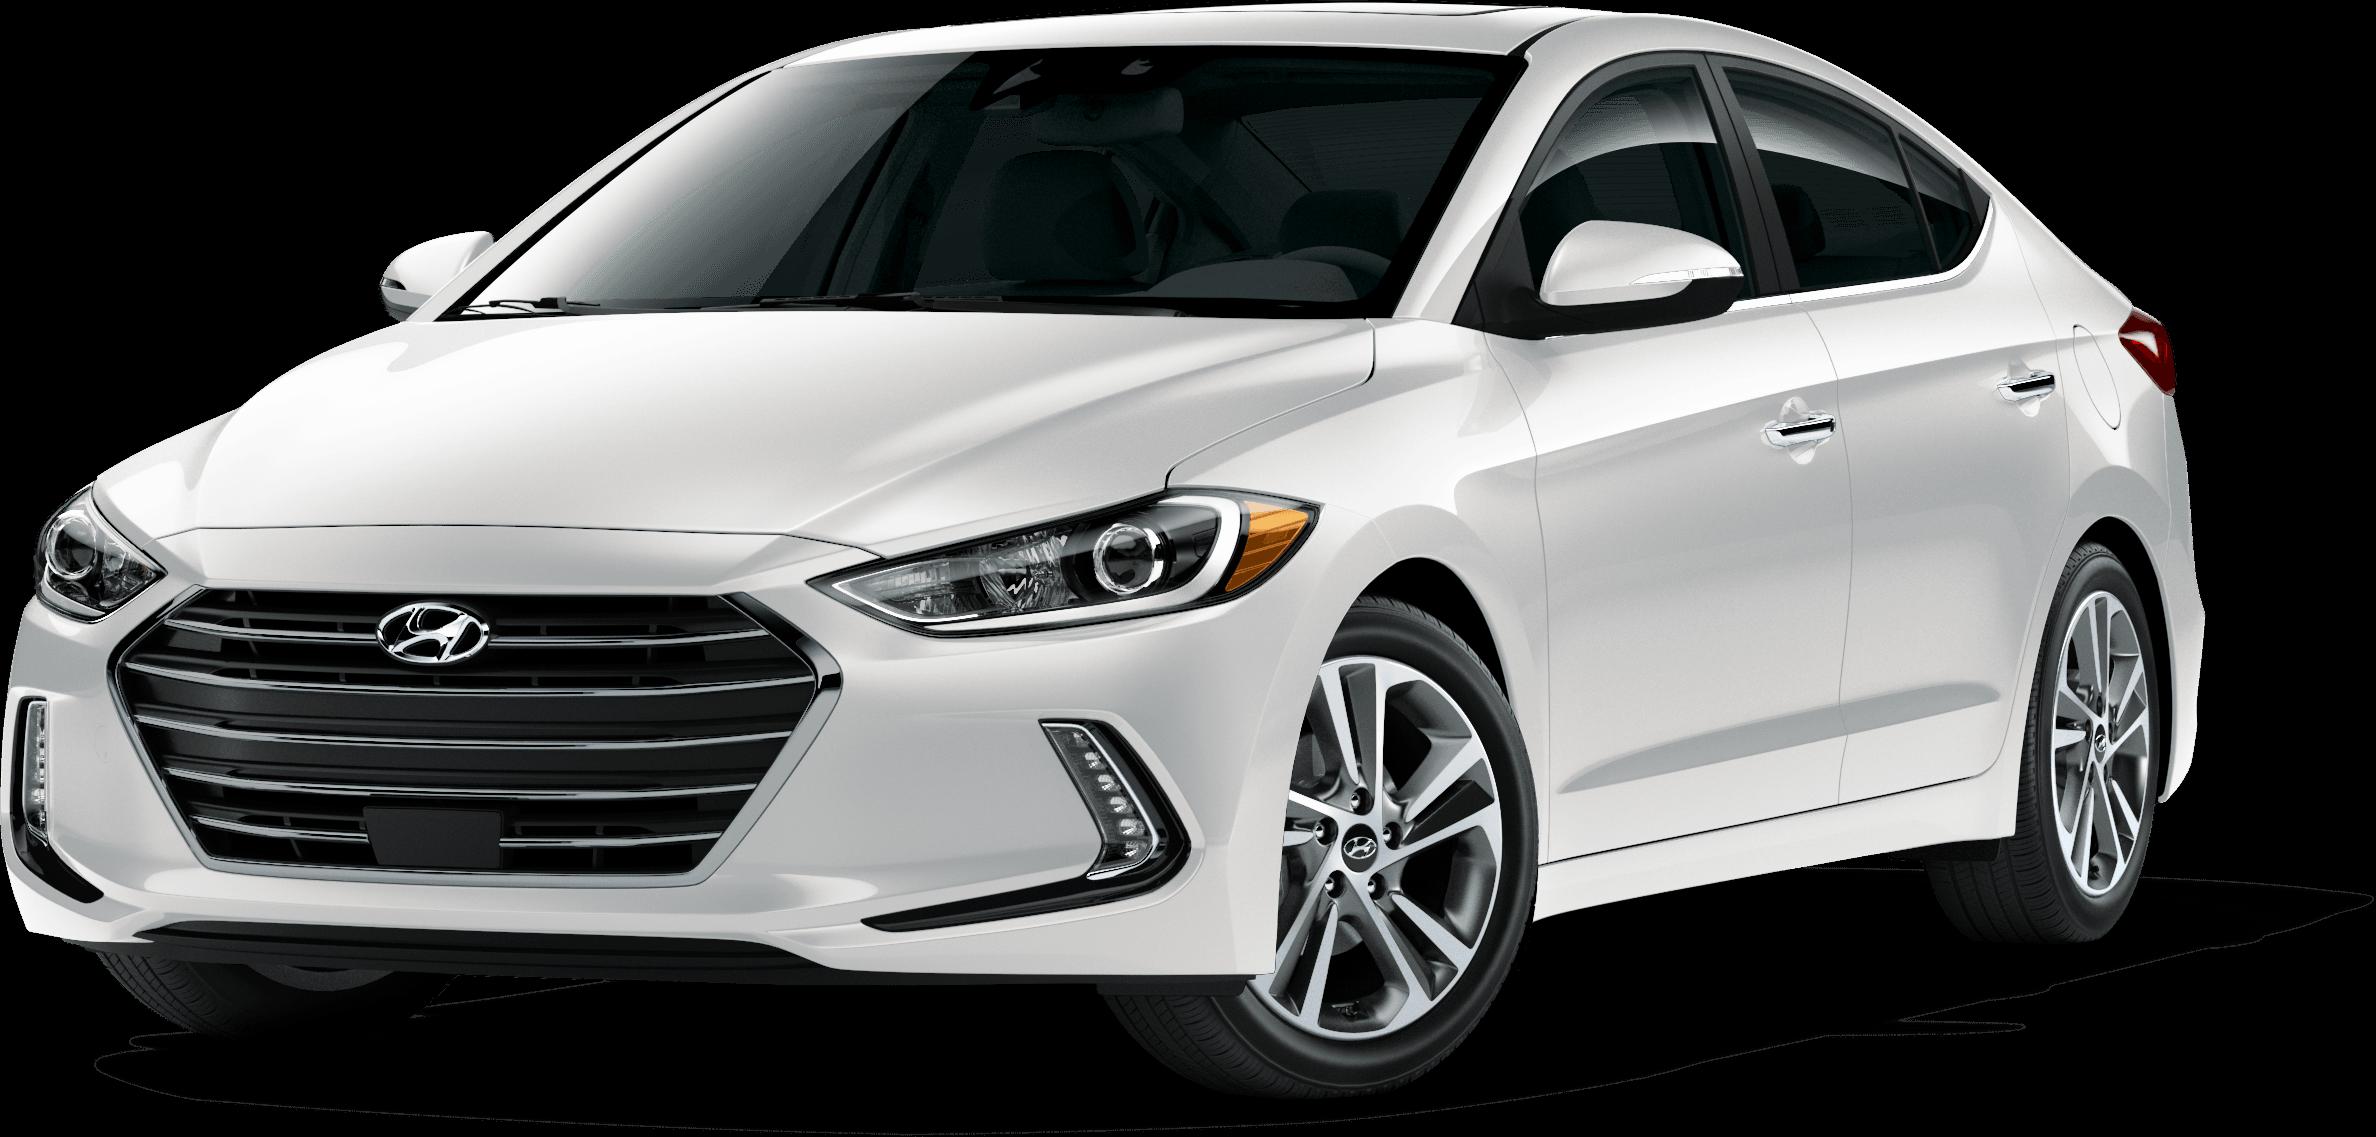 Bargain Prices on the 2018 Hyundai Elantra in Springfield, VA.